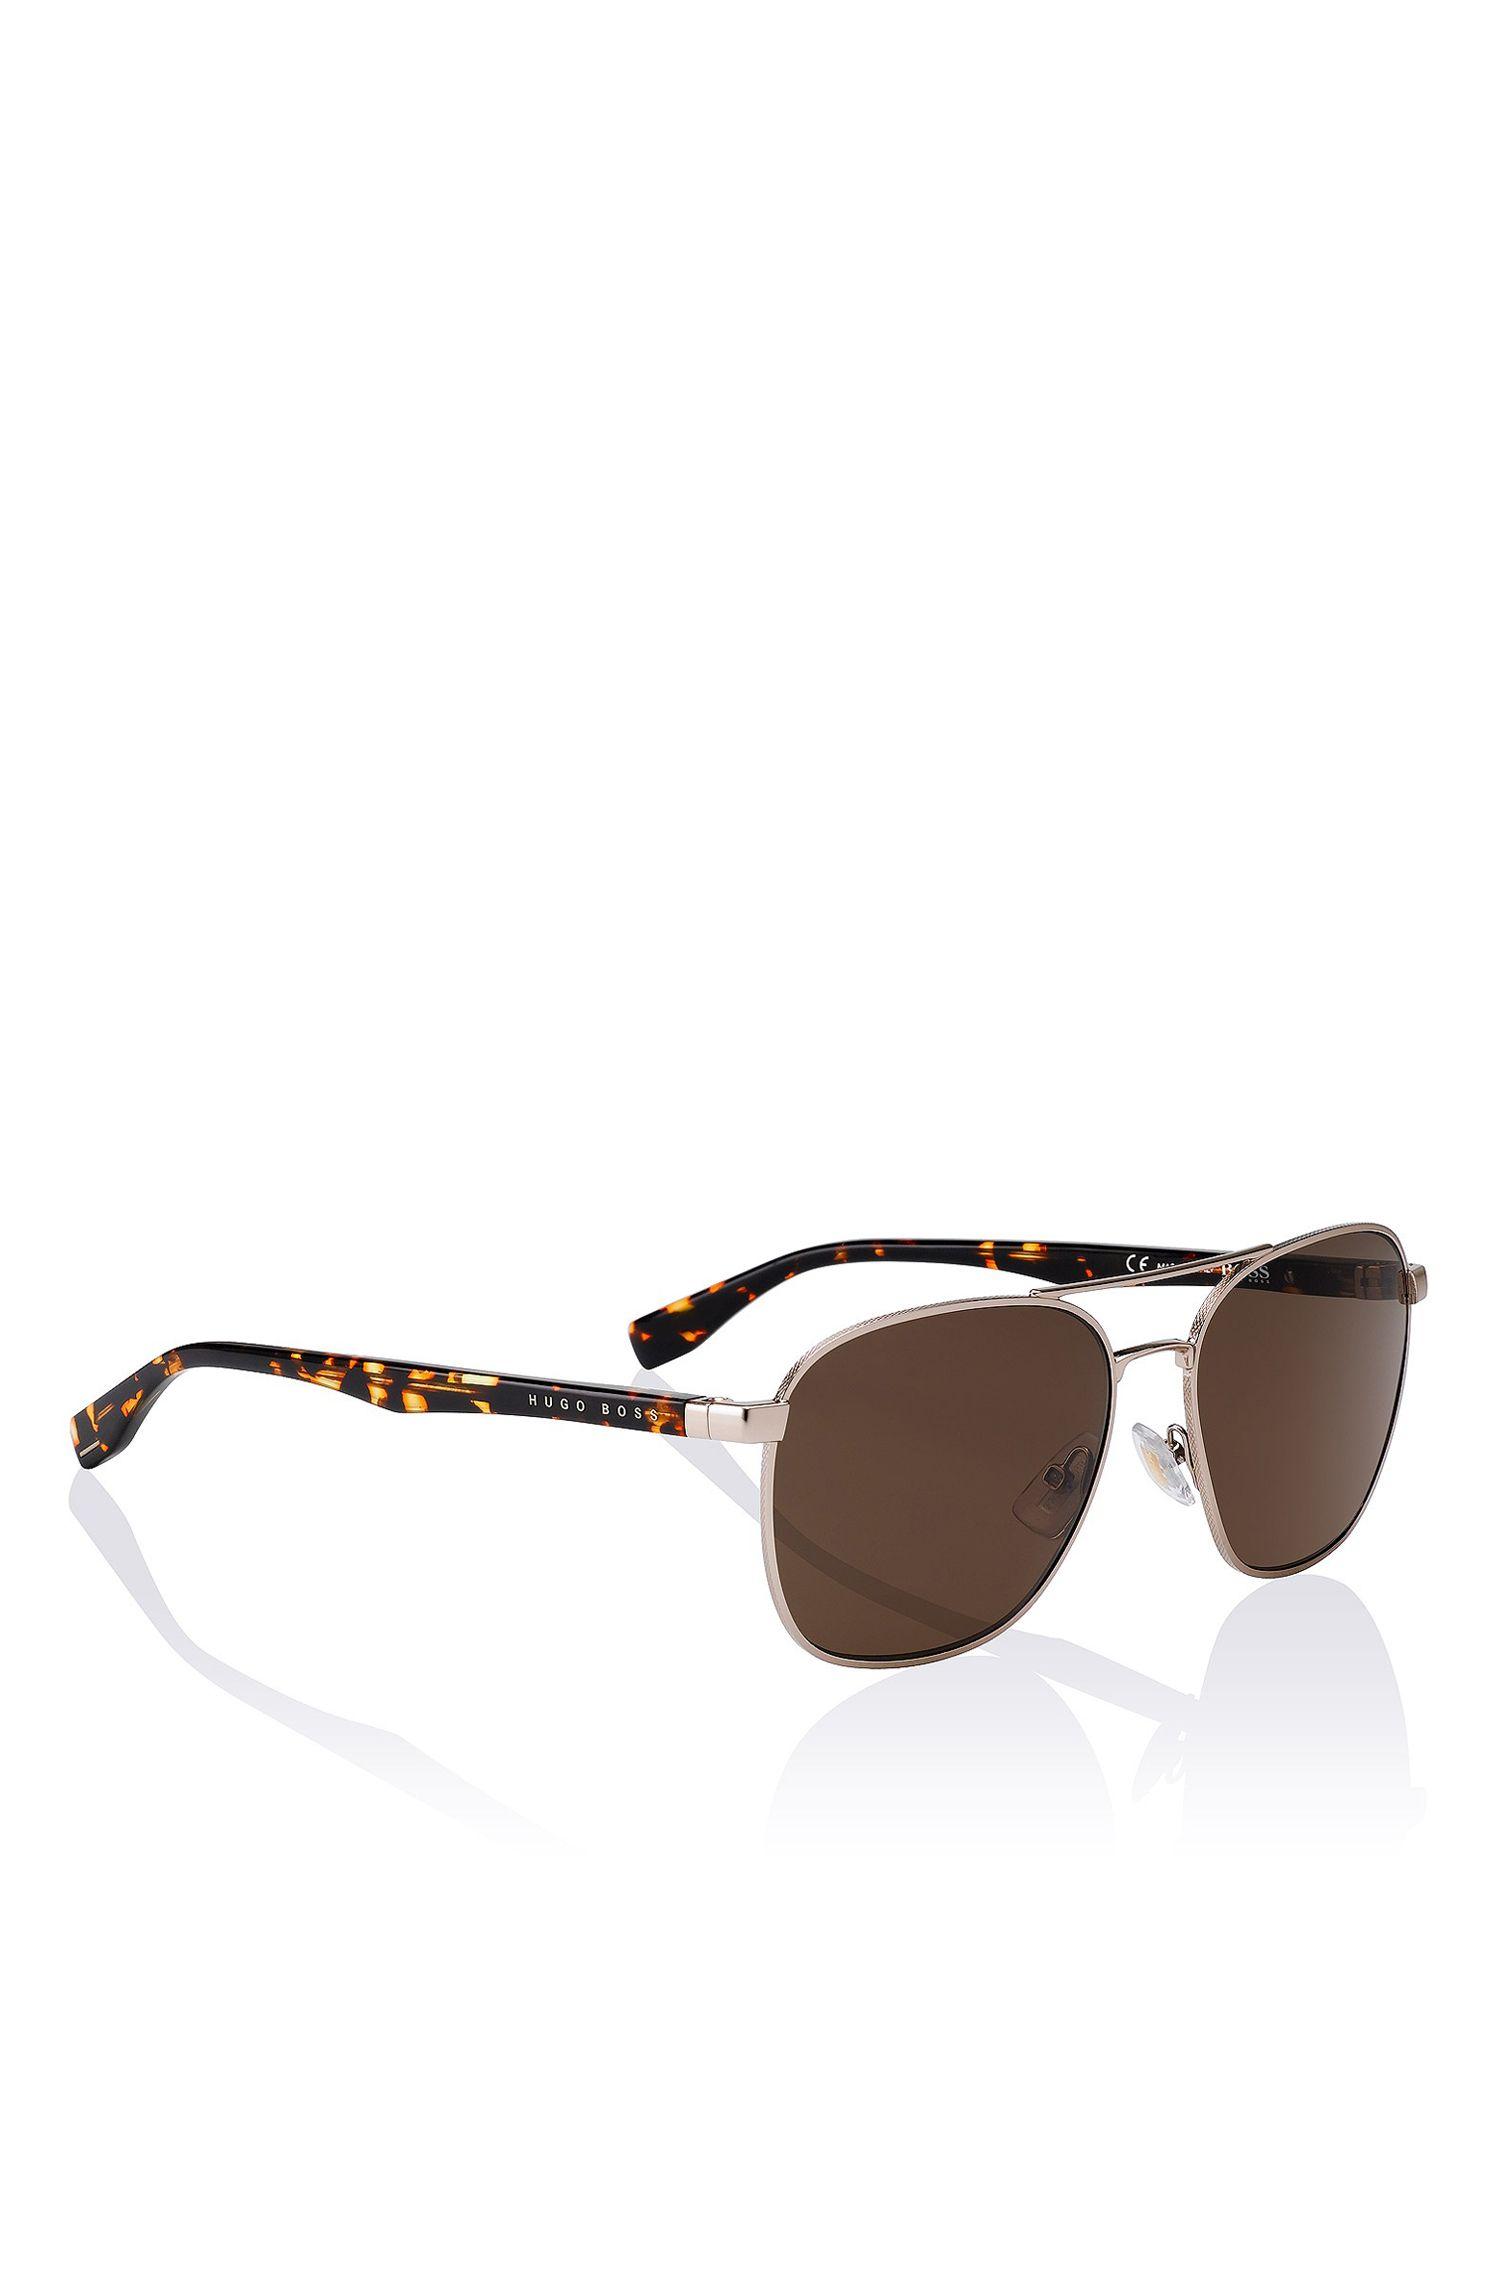 'BOSS 0701S' | Brown Lens Navigator Sunglasses